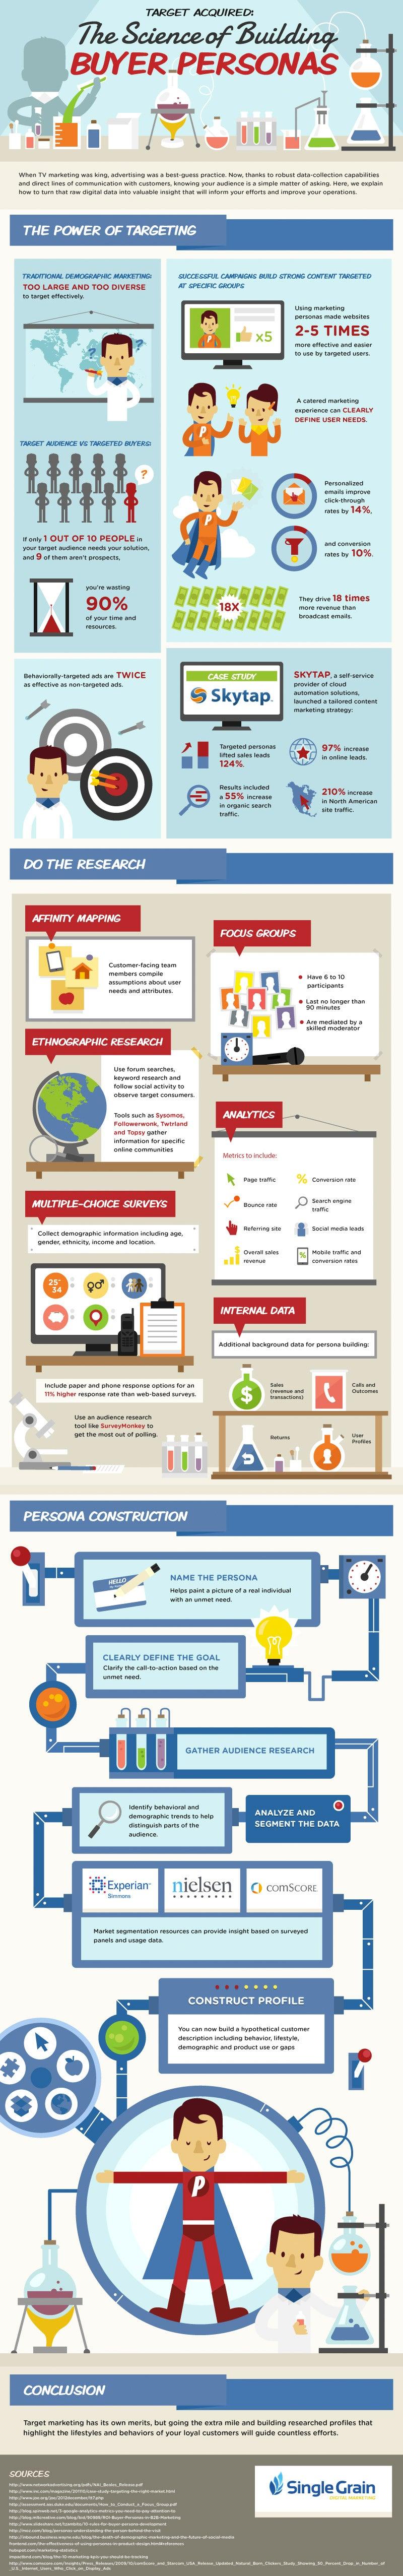 buyer persona infographic